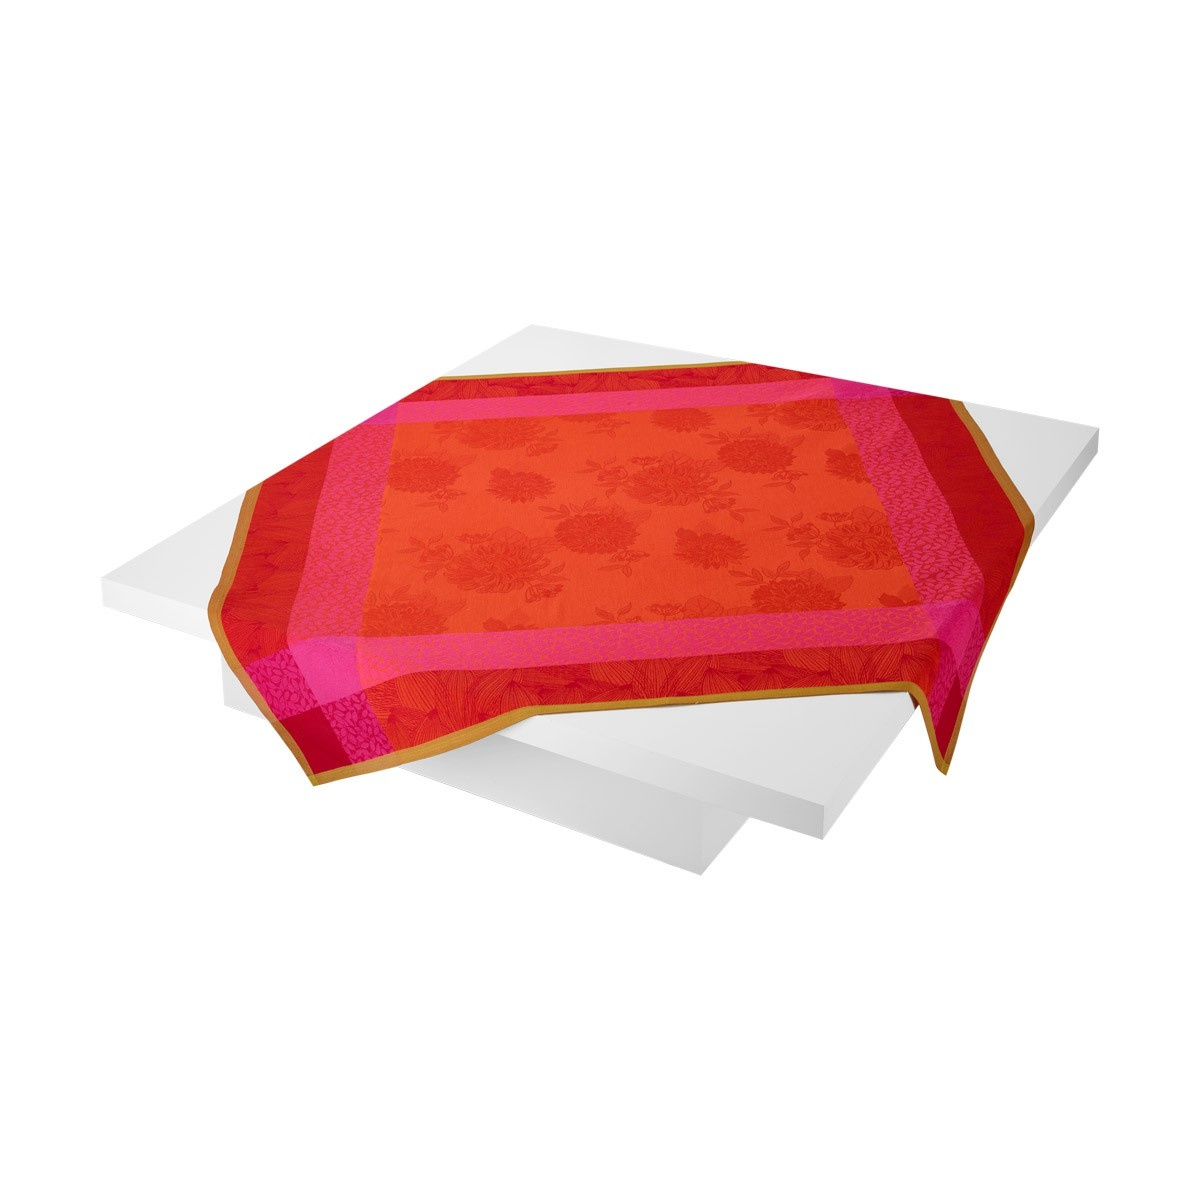 LJF Tablecloth Parfum Bagatelle Nasturtium 47x47